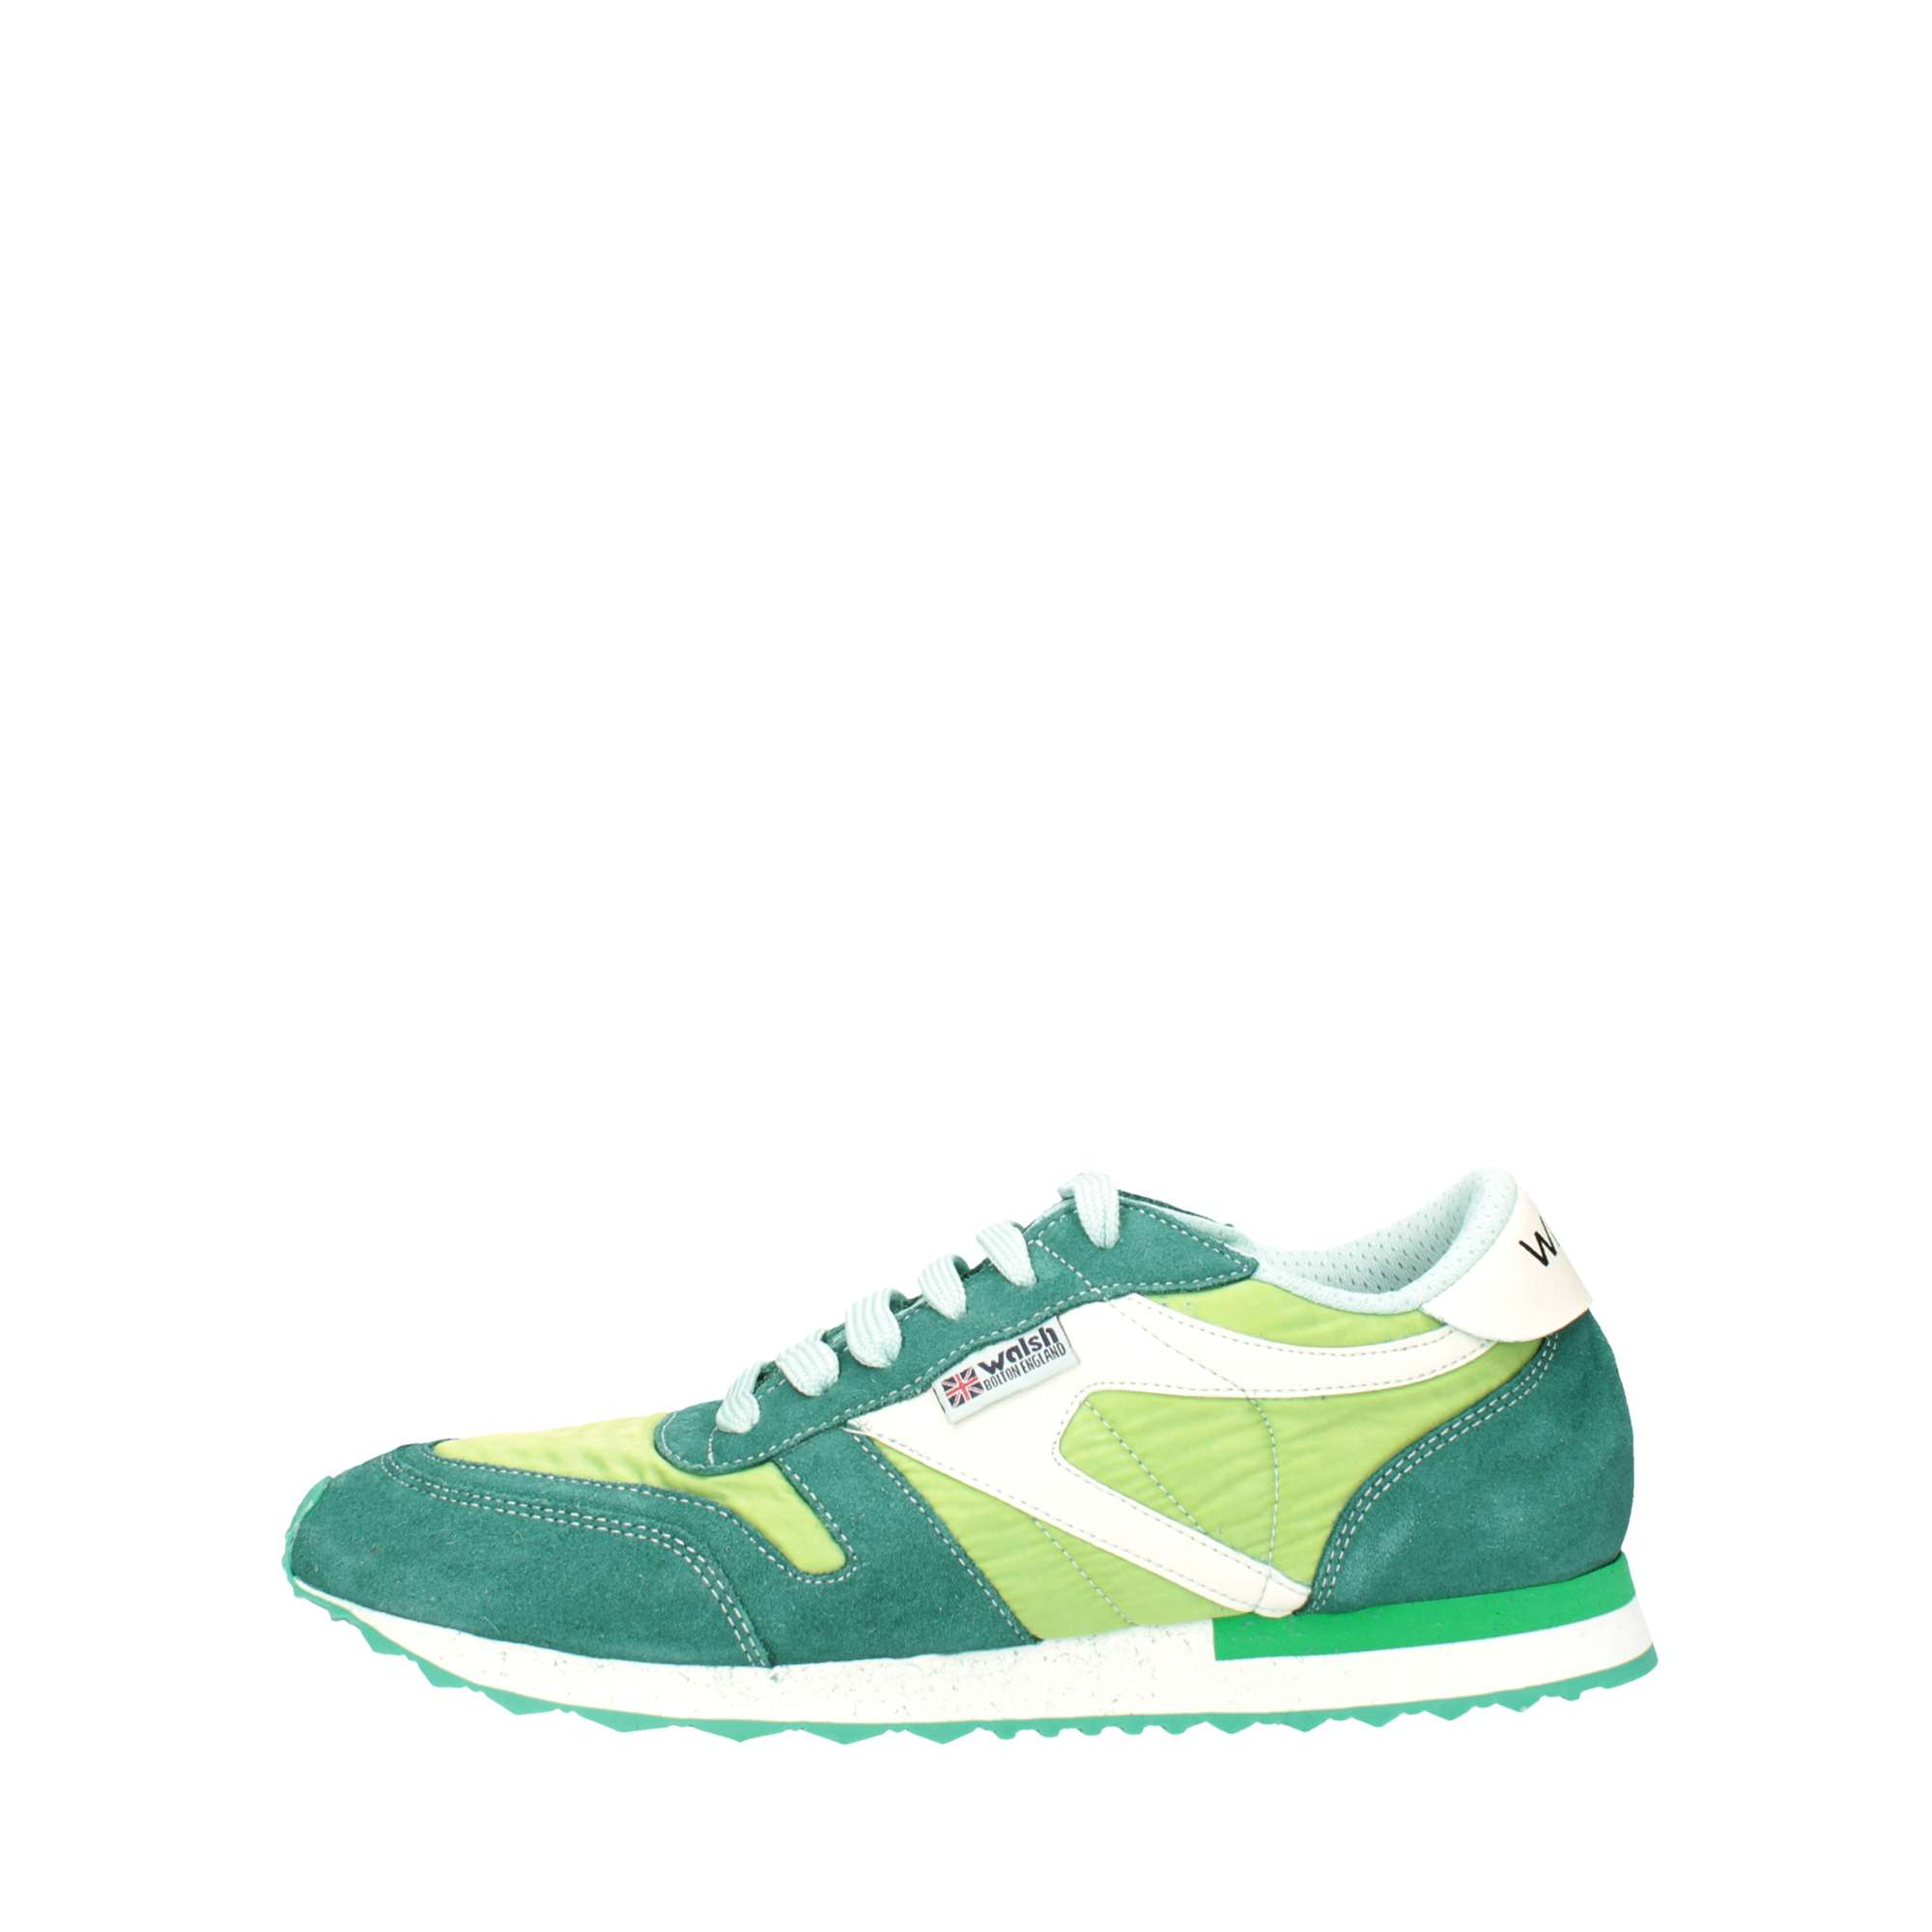 levis scarpe online   OFF46% sconti c16ee70fcff